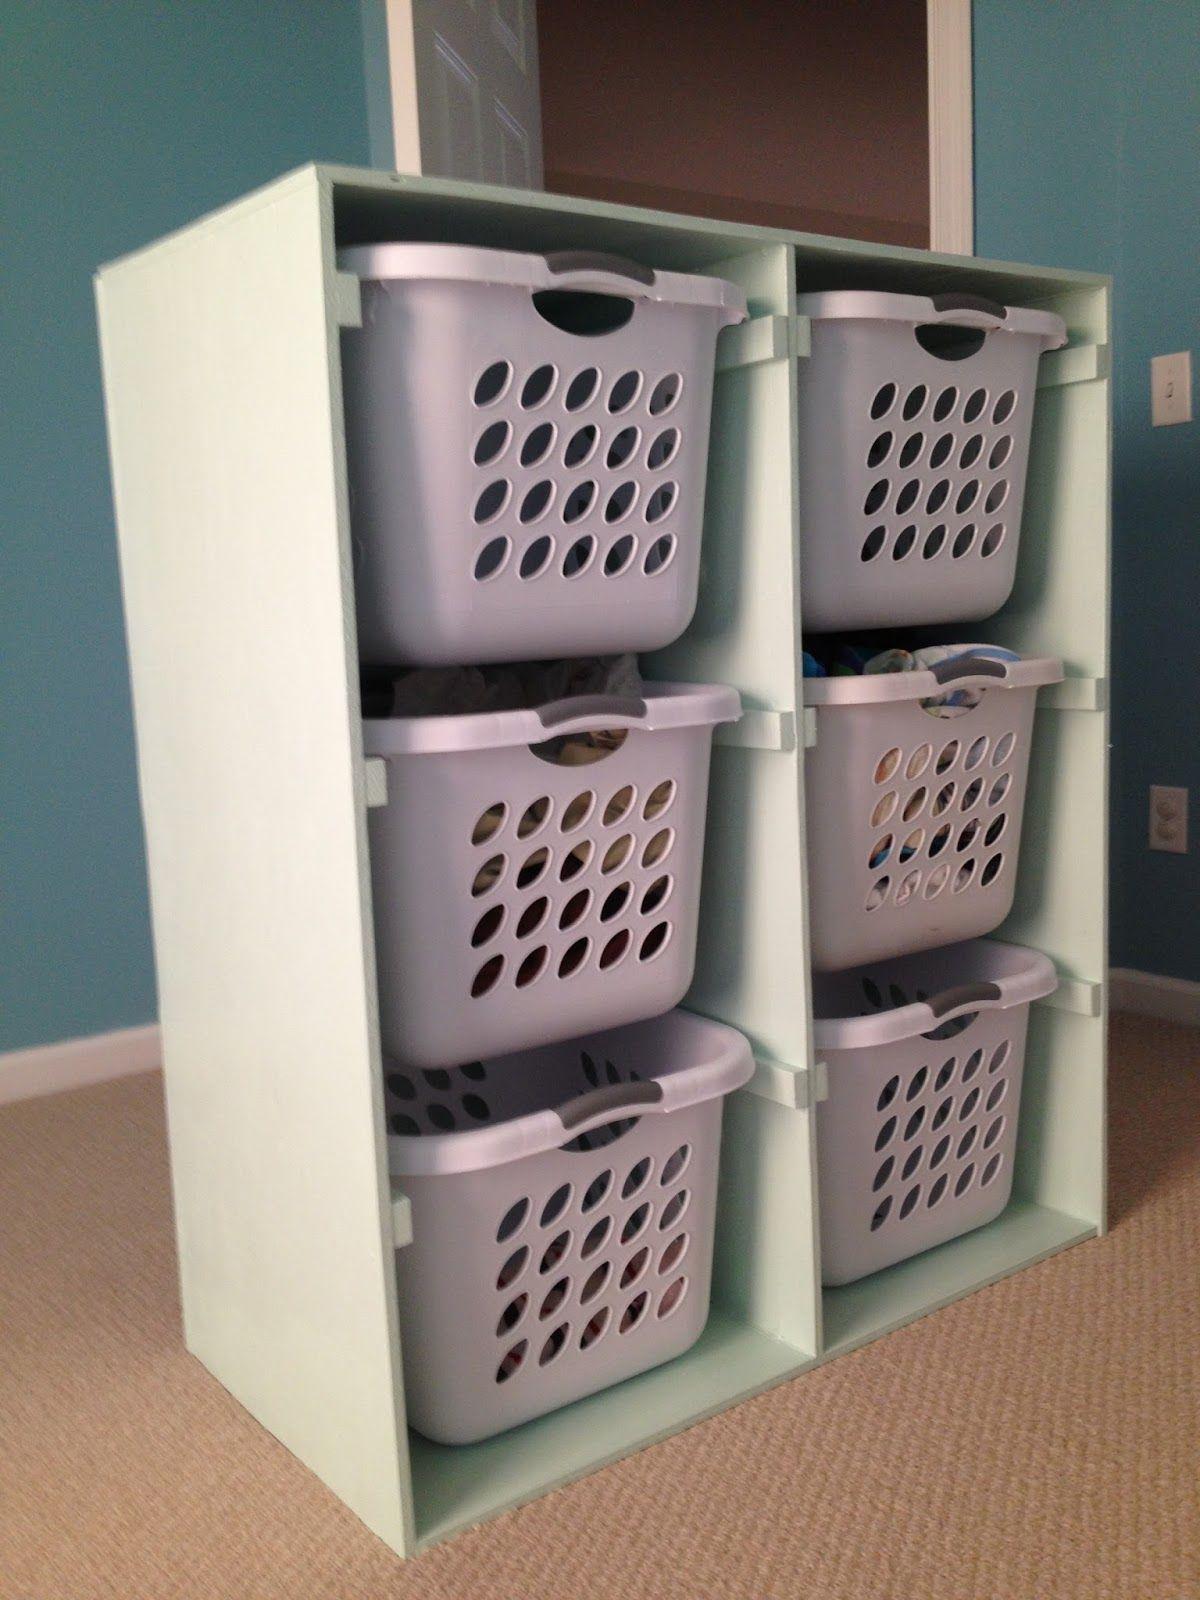 Build Shelves For Your Laundry Baskets Diy Laundry Basket